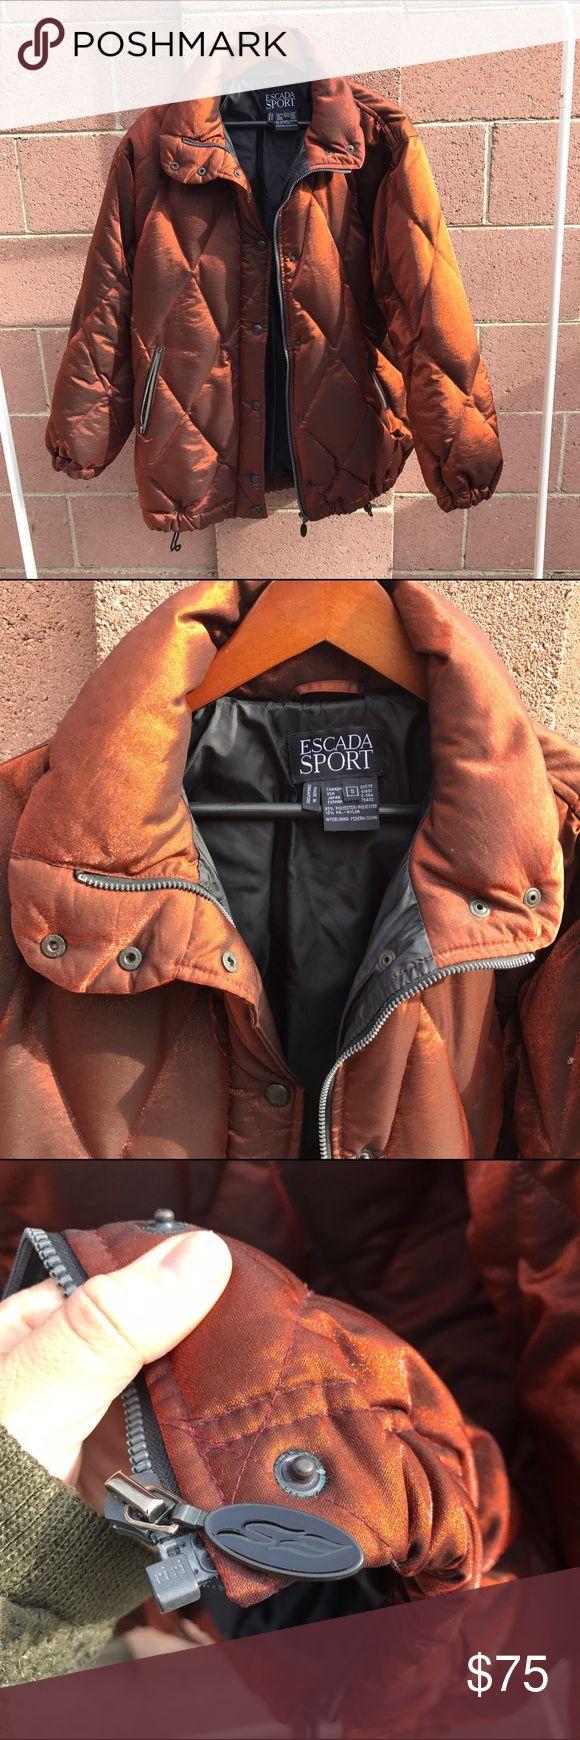 ESCADA SPORT SZ SMALL OVERSIZED PUFFER JACKET Super cute metallic style puffer jacket Escada Jackets & Coats